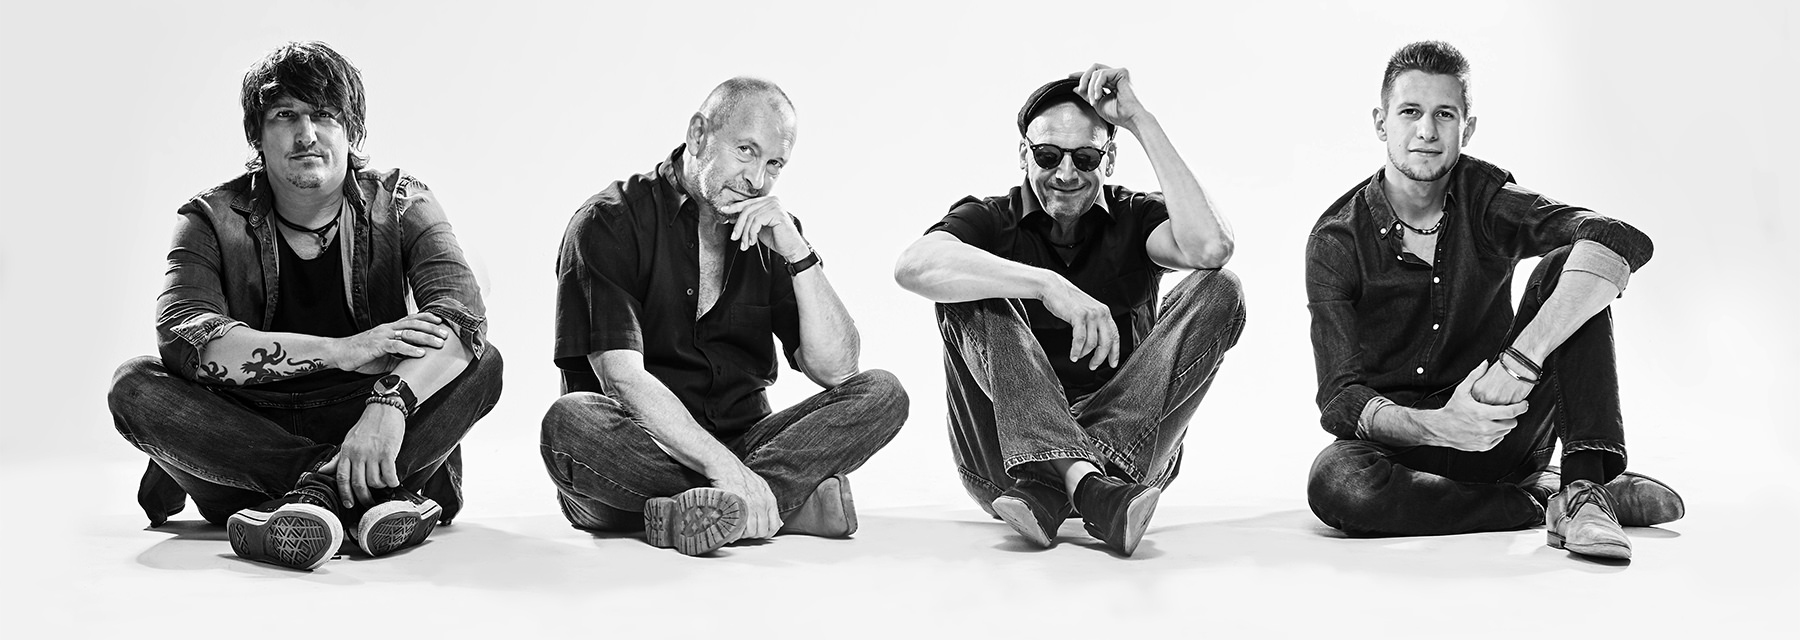 Marco Ribbe Photography,fotograf heilbronn, Bandfotografie, Bandfoto Gonzo's Friends